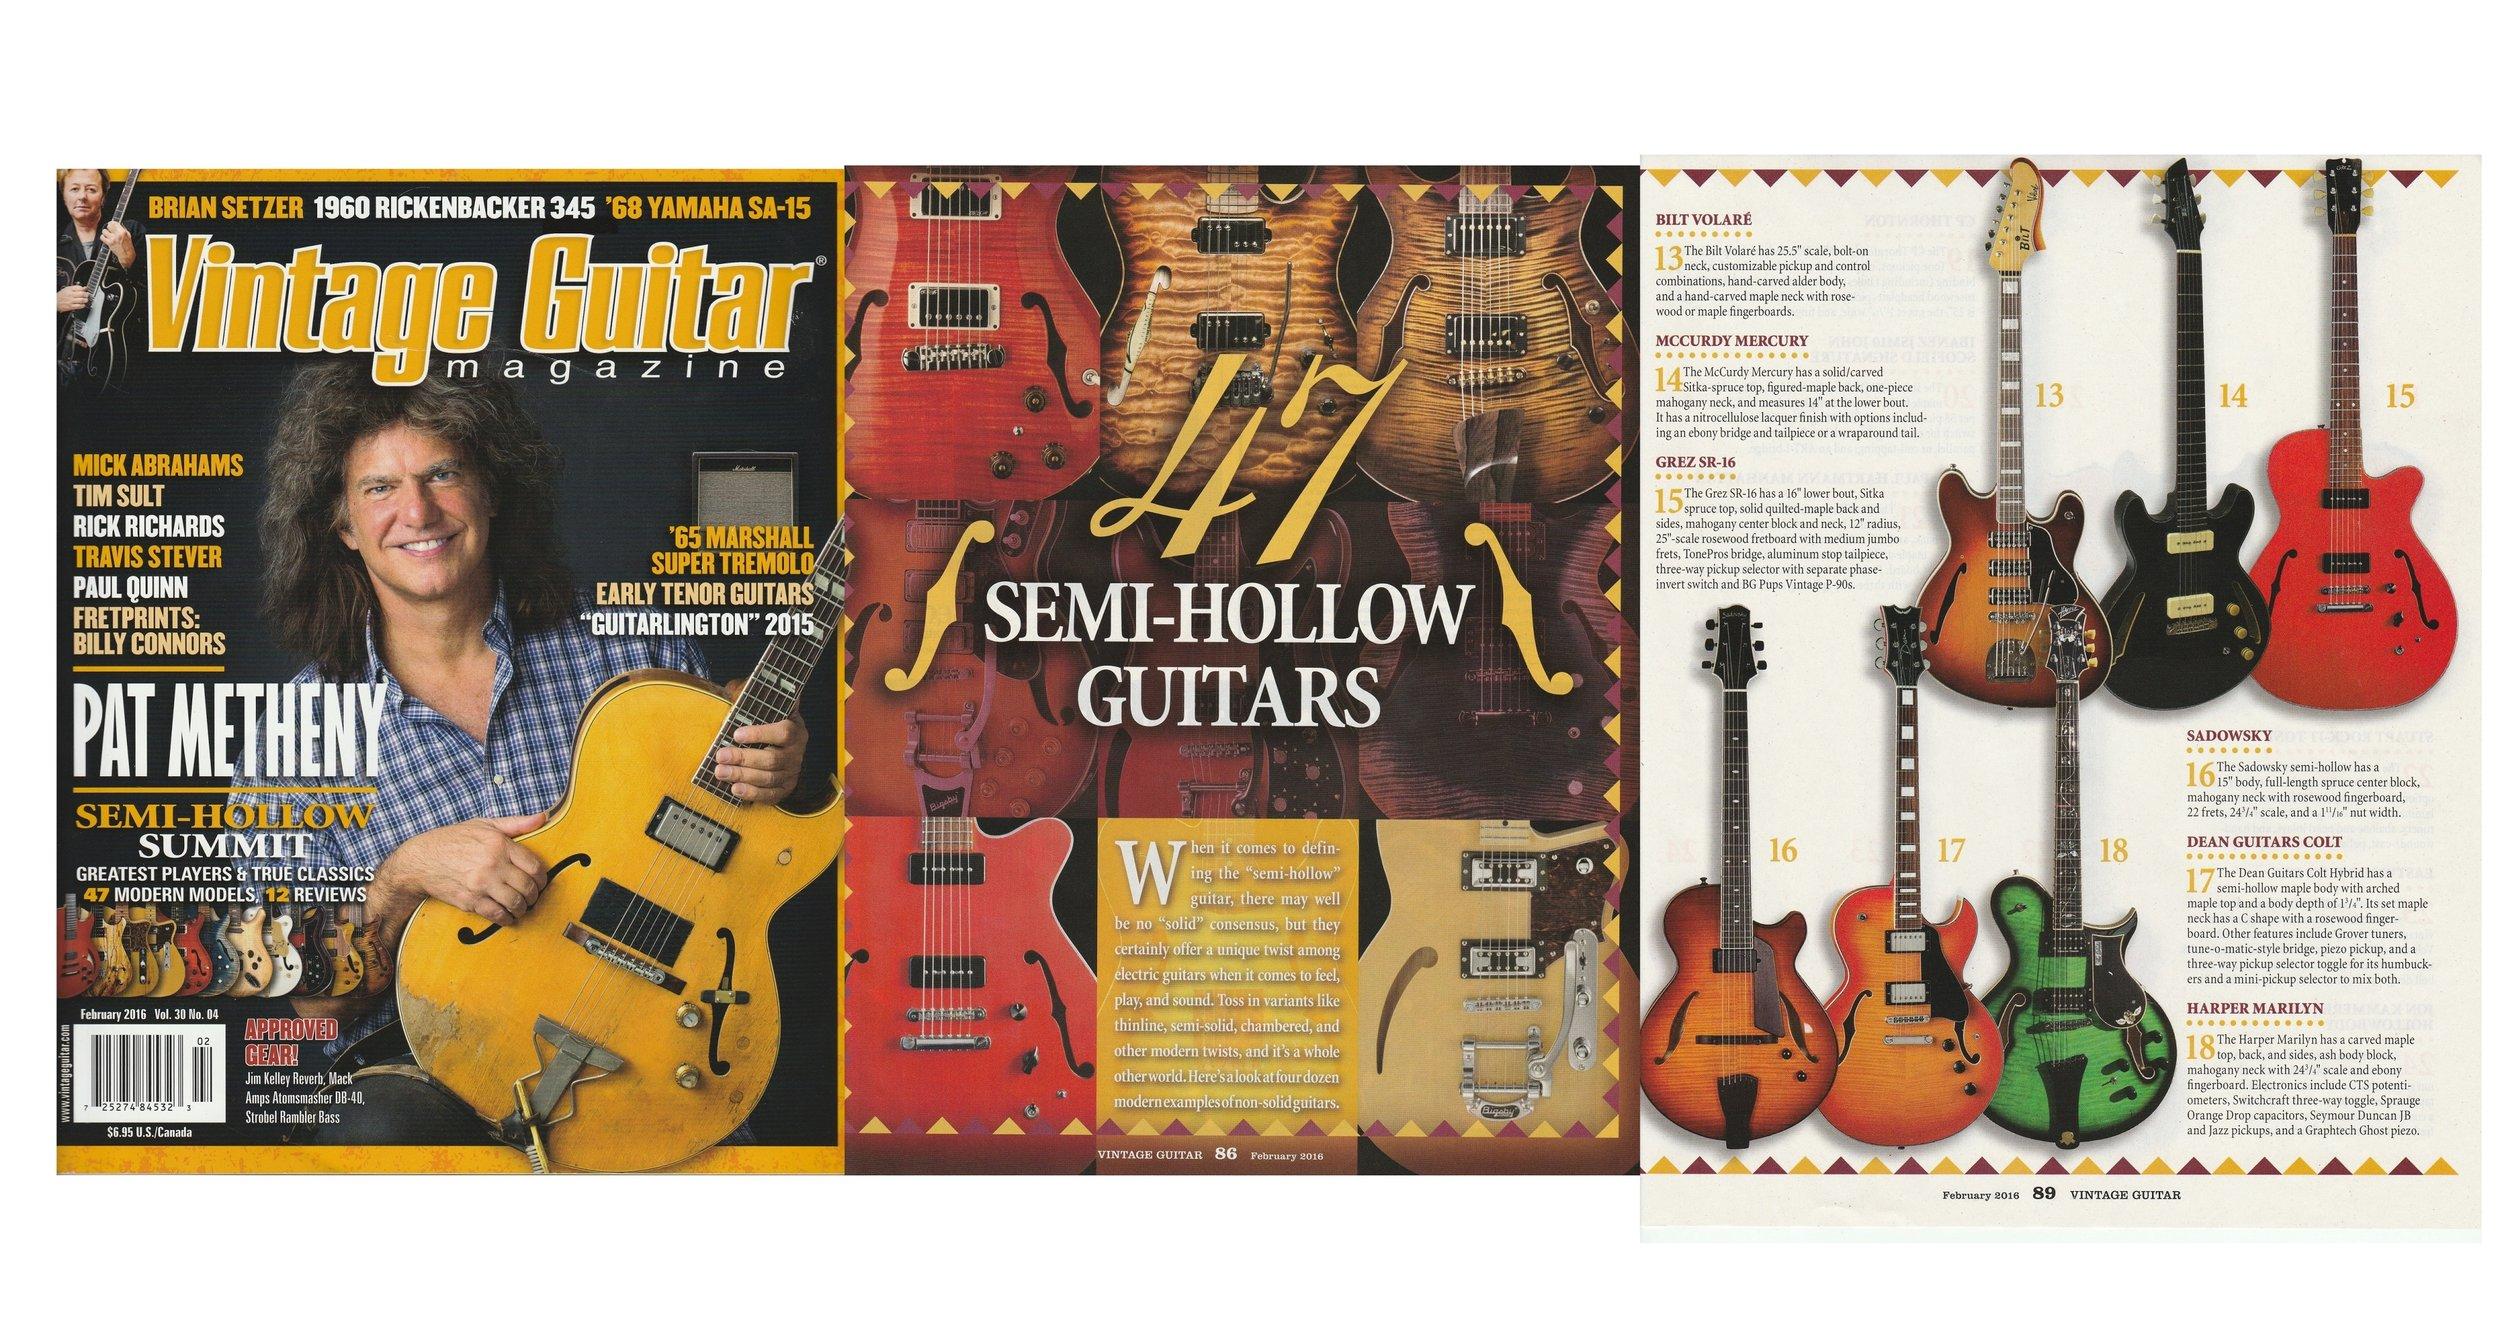 Harper Marilyn featured in Vintage Guitar Magazine!